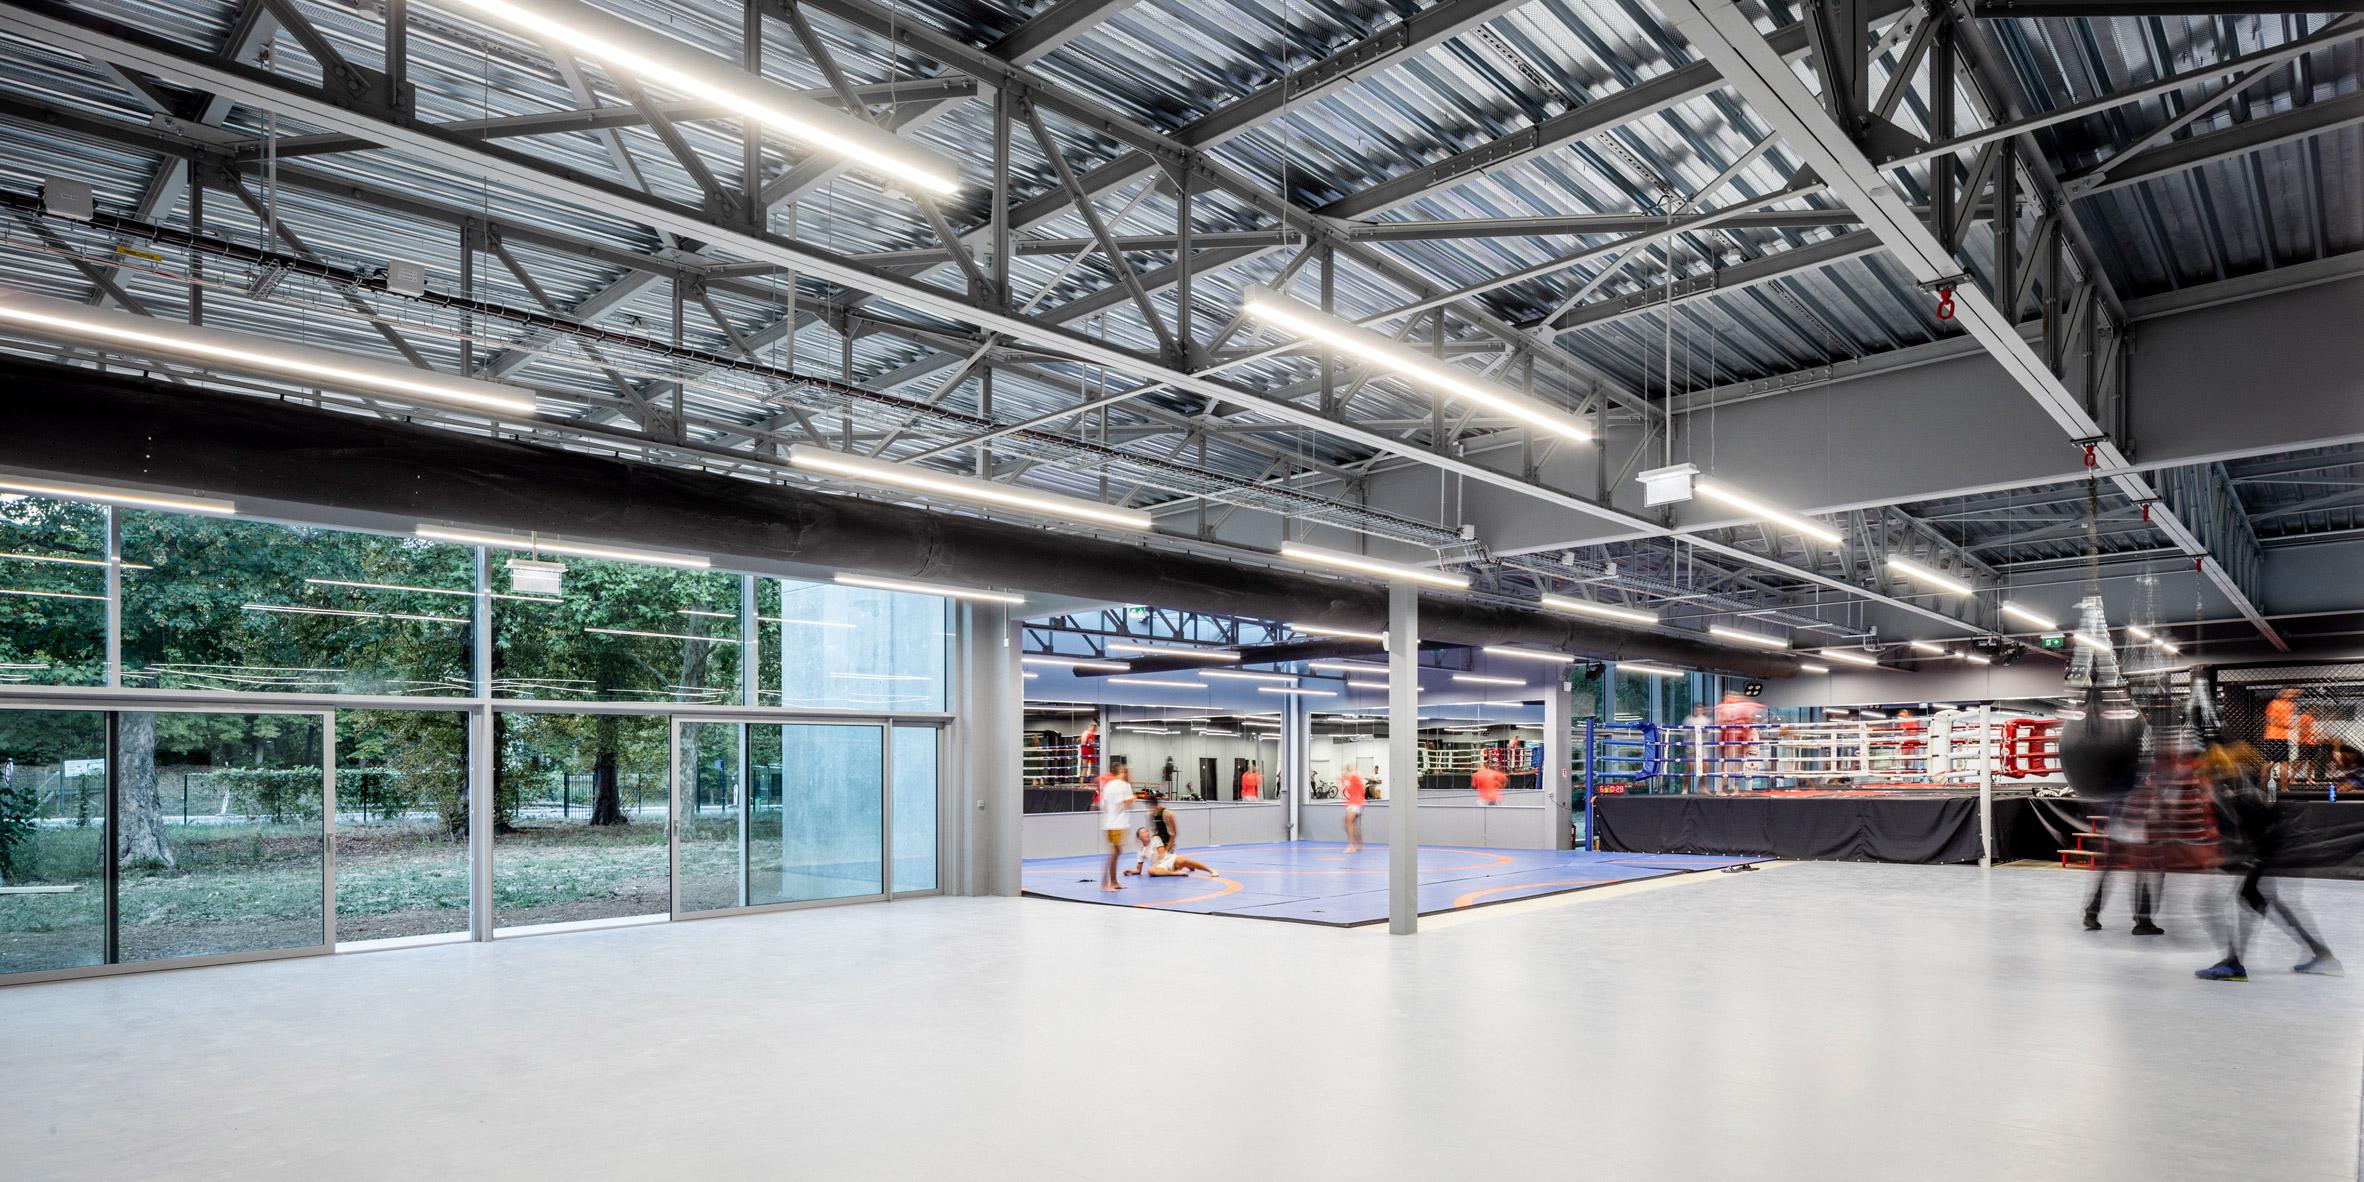 Gym in France